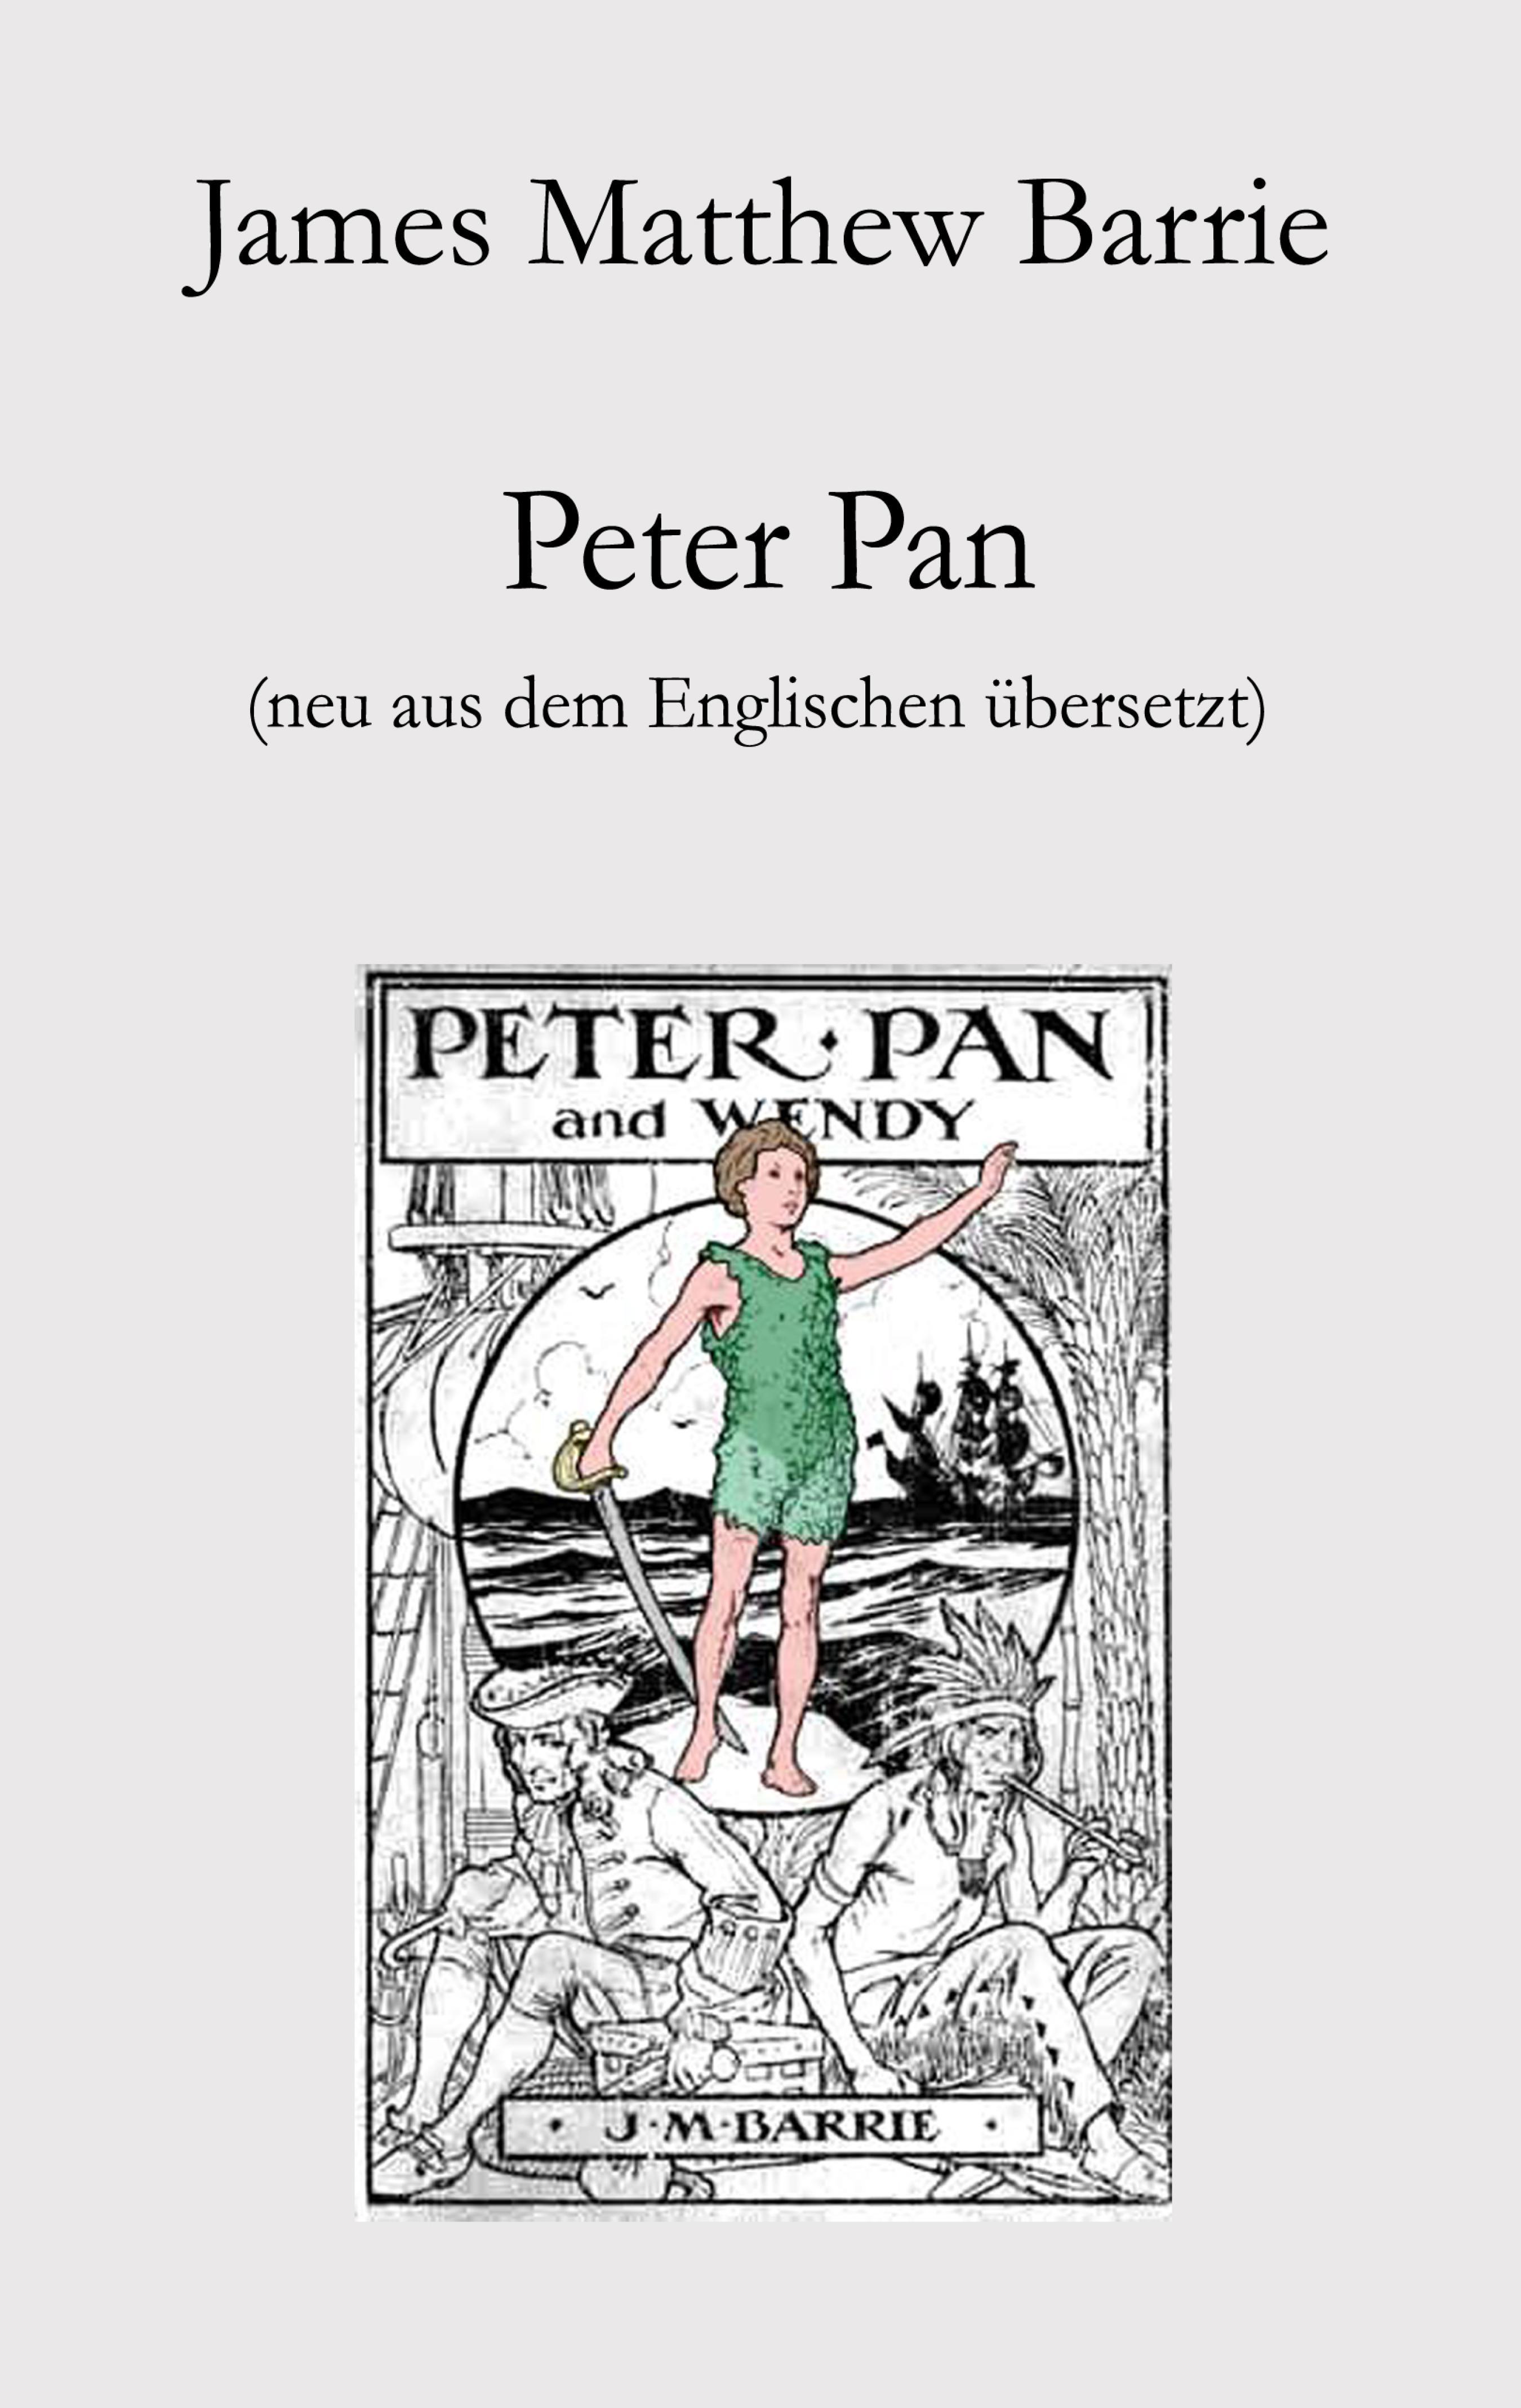 James Matthew Barrie Peter Pan